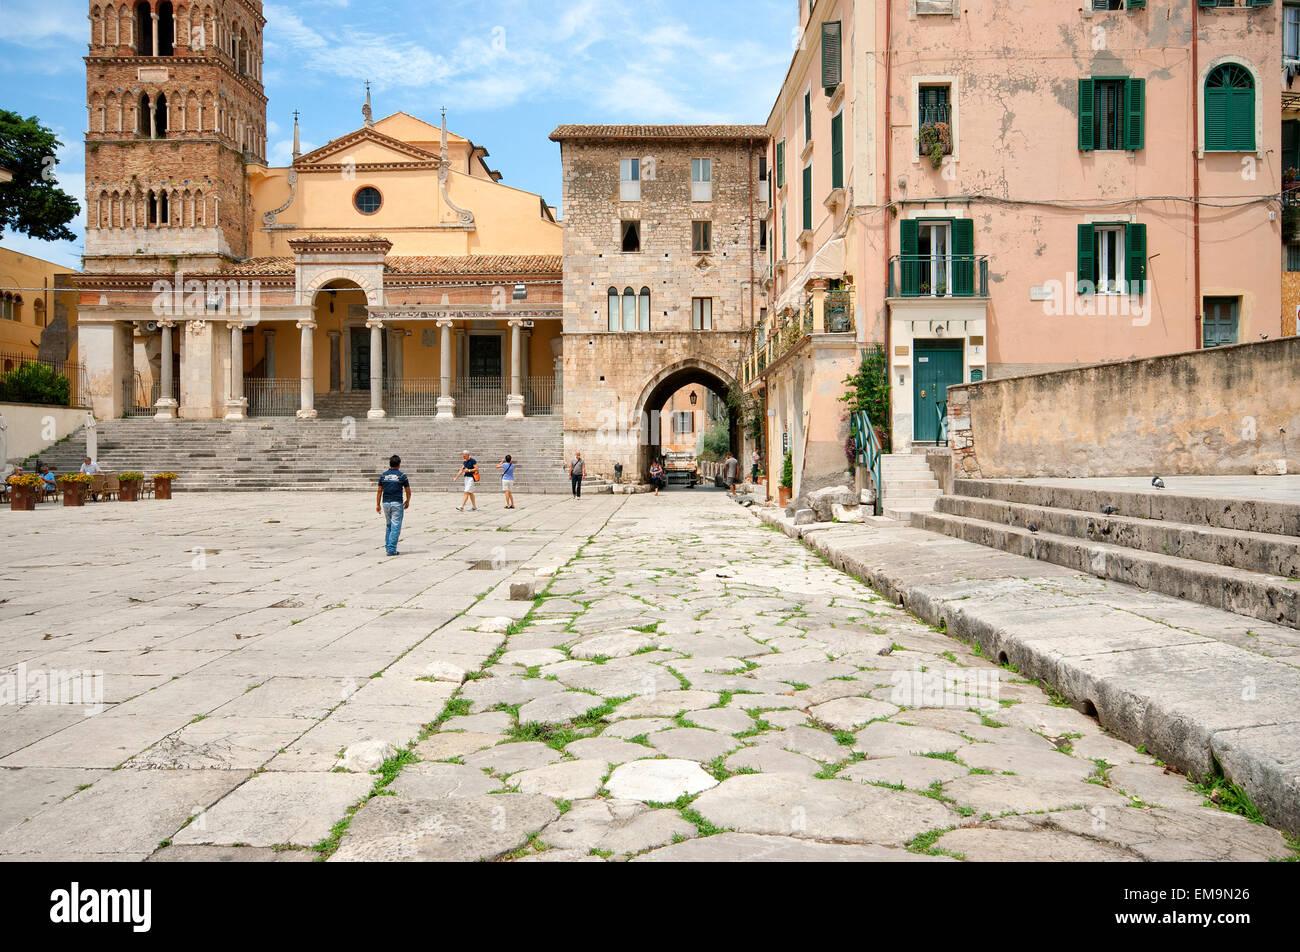 Terracina, Piazza Municipio con San Cesareo Duomo (Iglesia) y la antigua Via Appia, Lacio, Italia Imagen De Stock